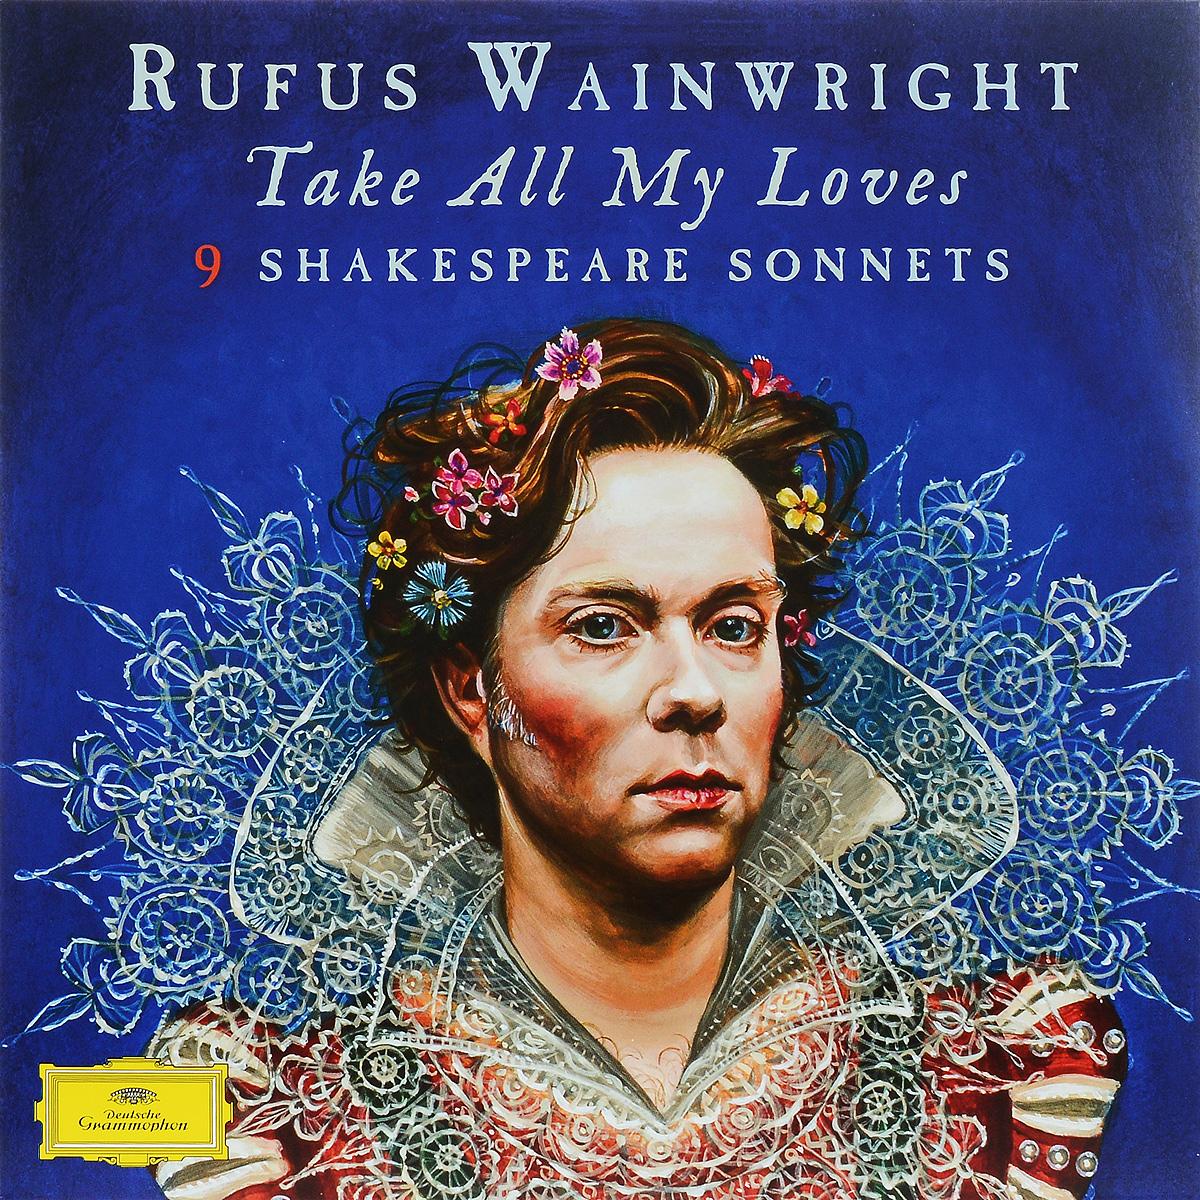 Руфус Уэйнрайт Rufus Wainwright. Take All My Loves. 9 Shakespeare Sonnets (2 LP) shakespeare w sonnets